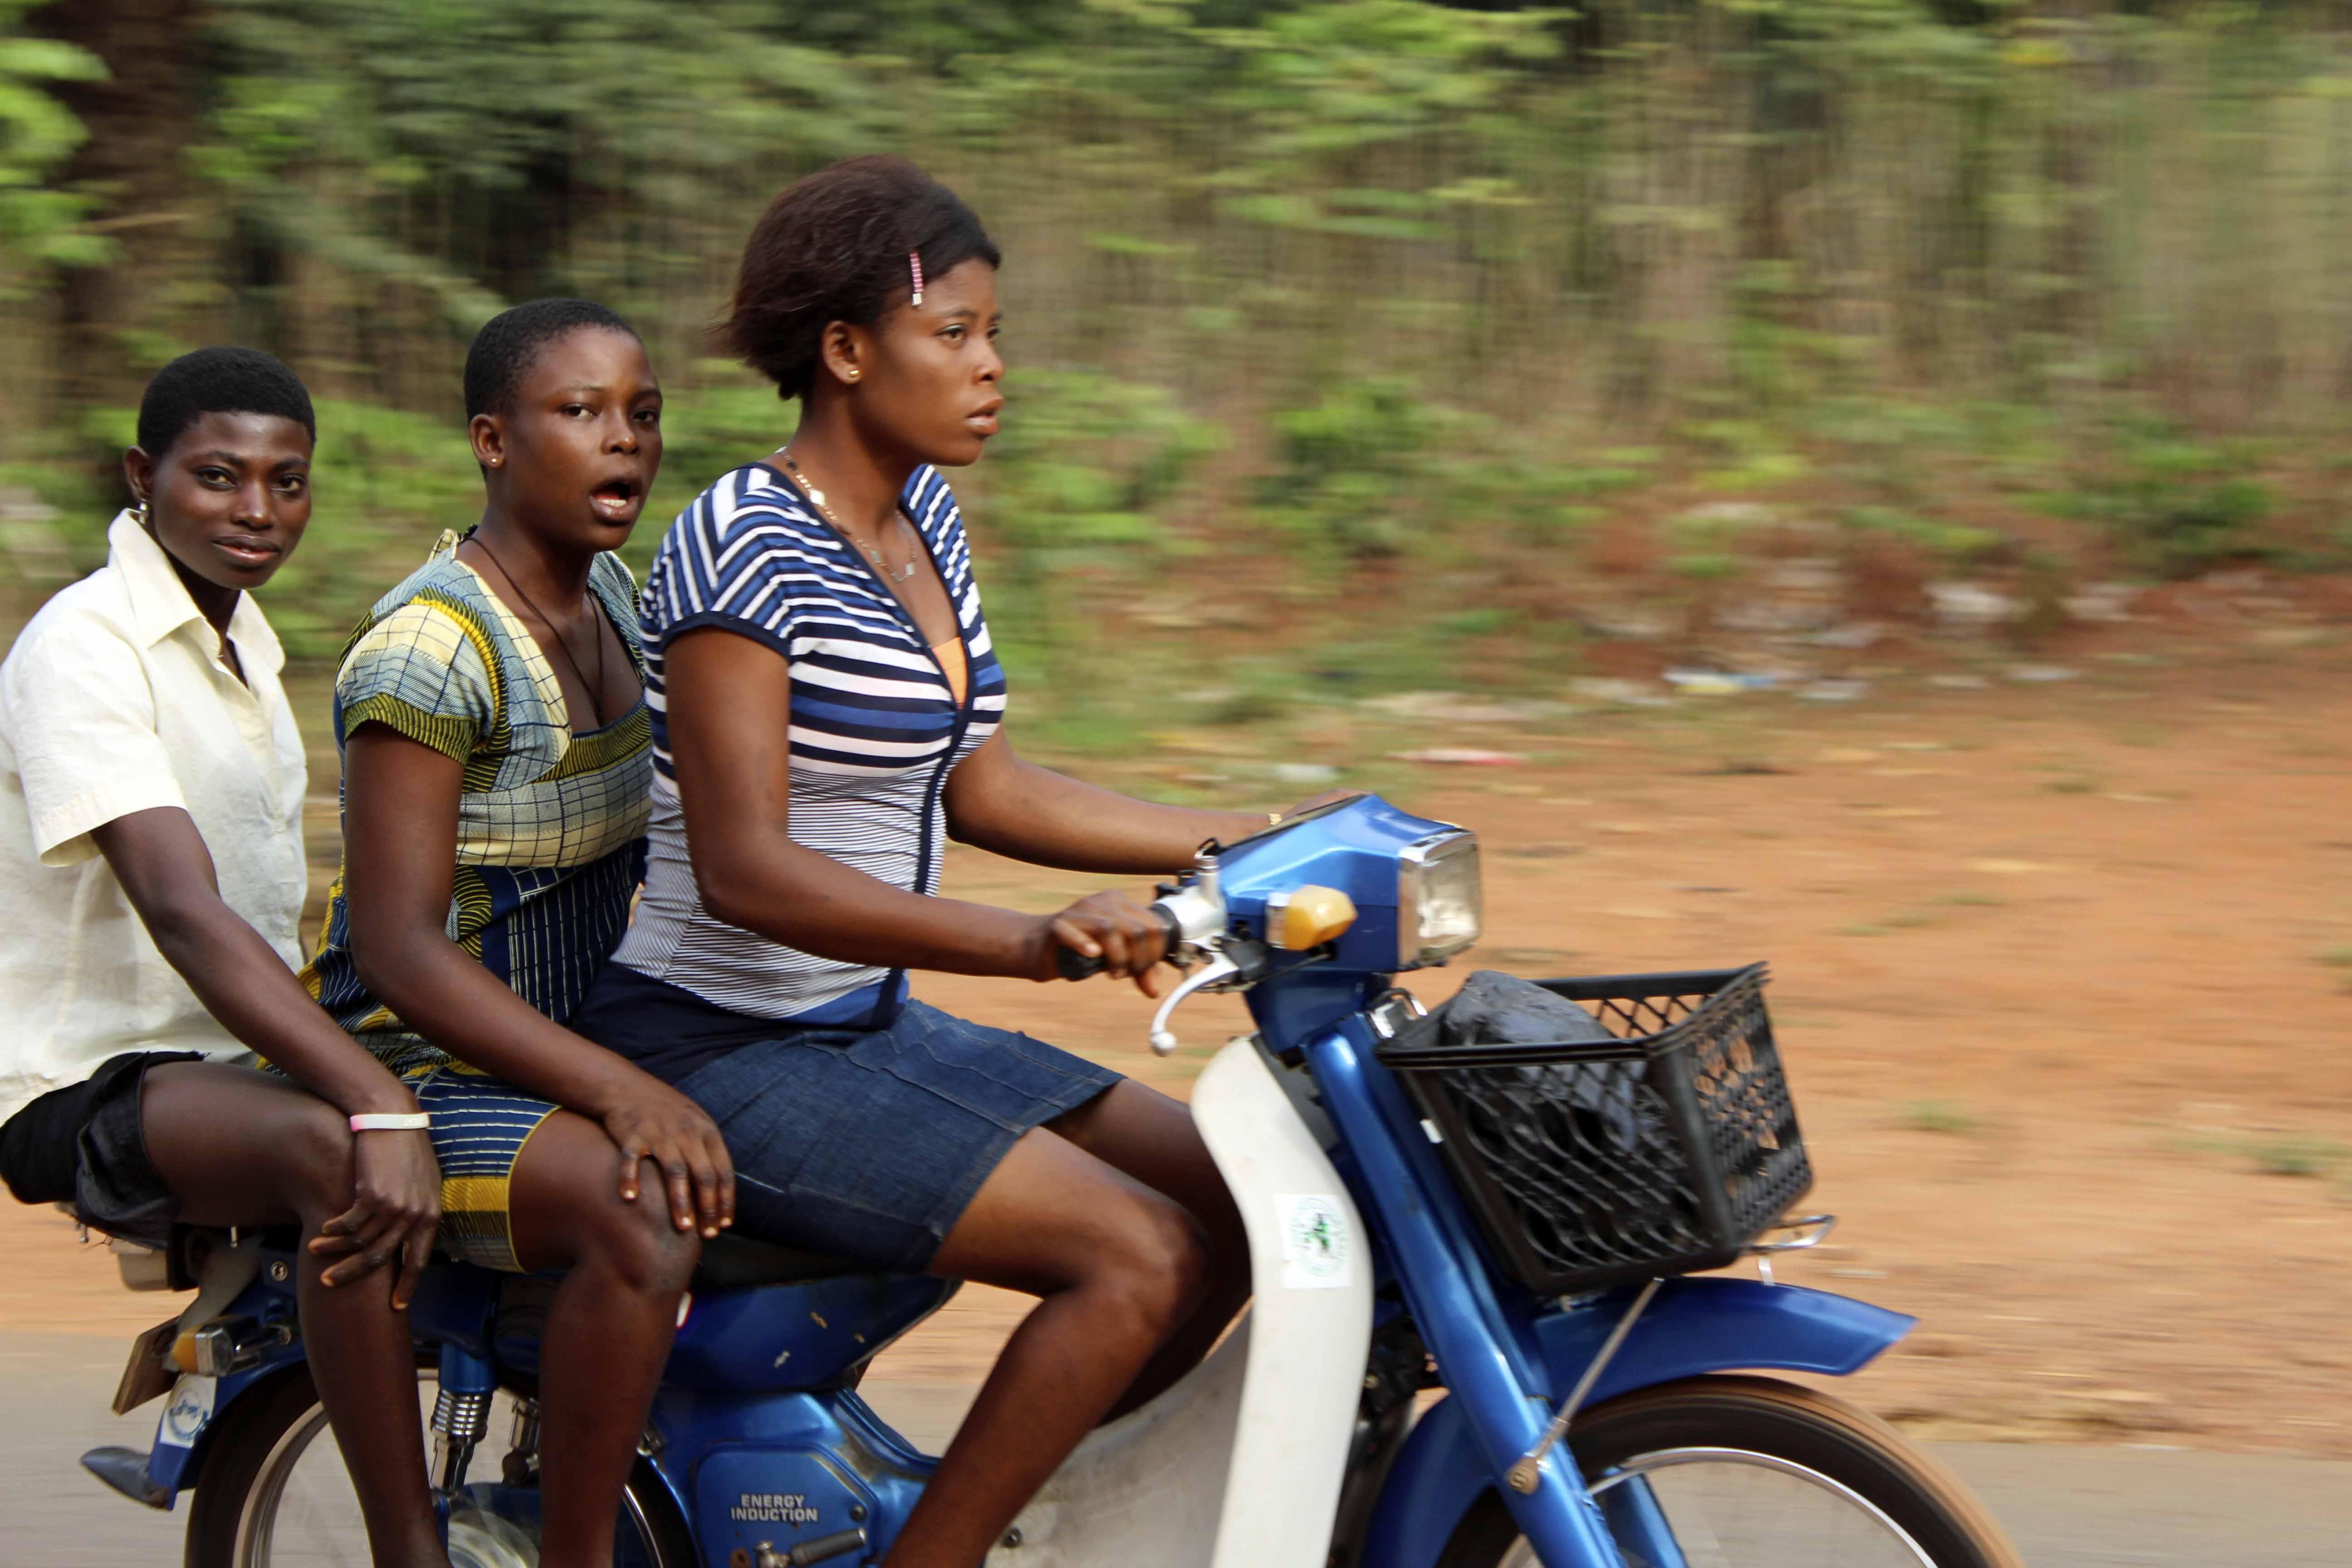 Igbo girls motorcycling in Obolo Village, Enugu State, Nigeria. #JujuFilms